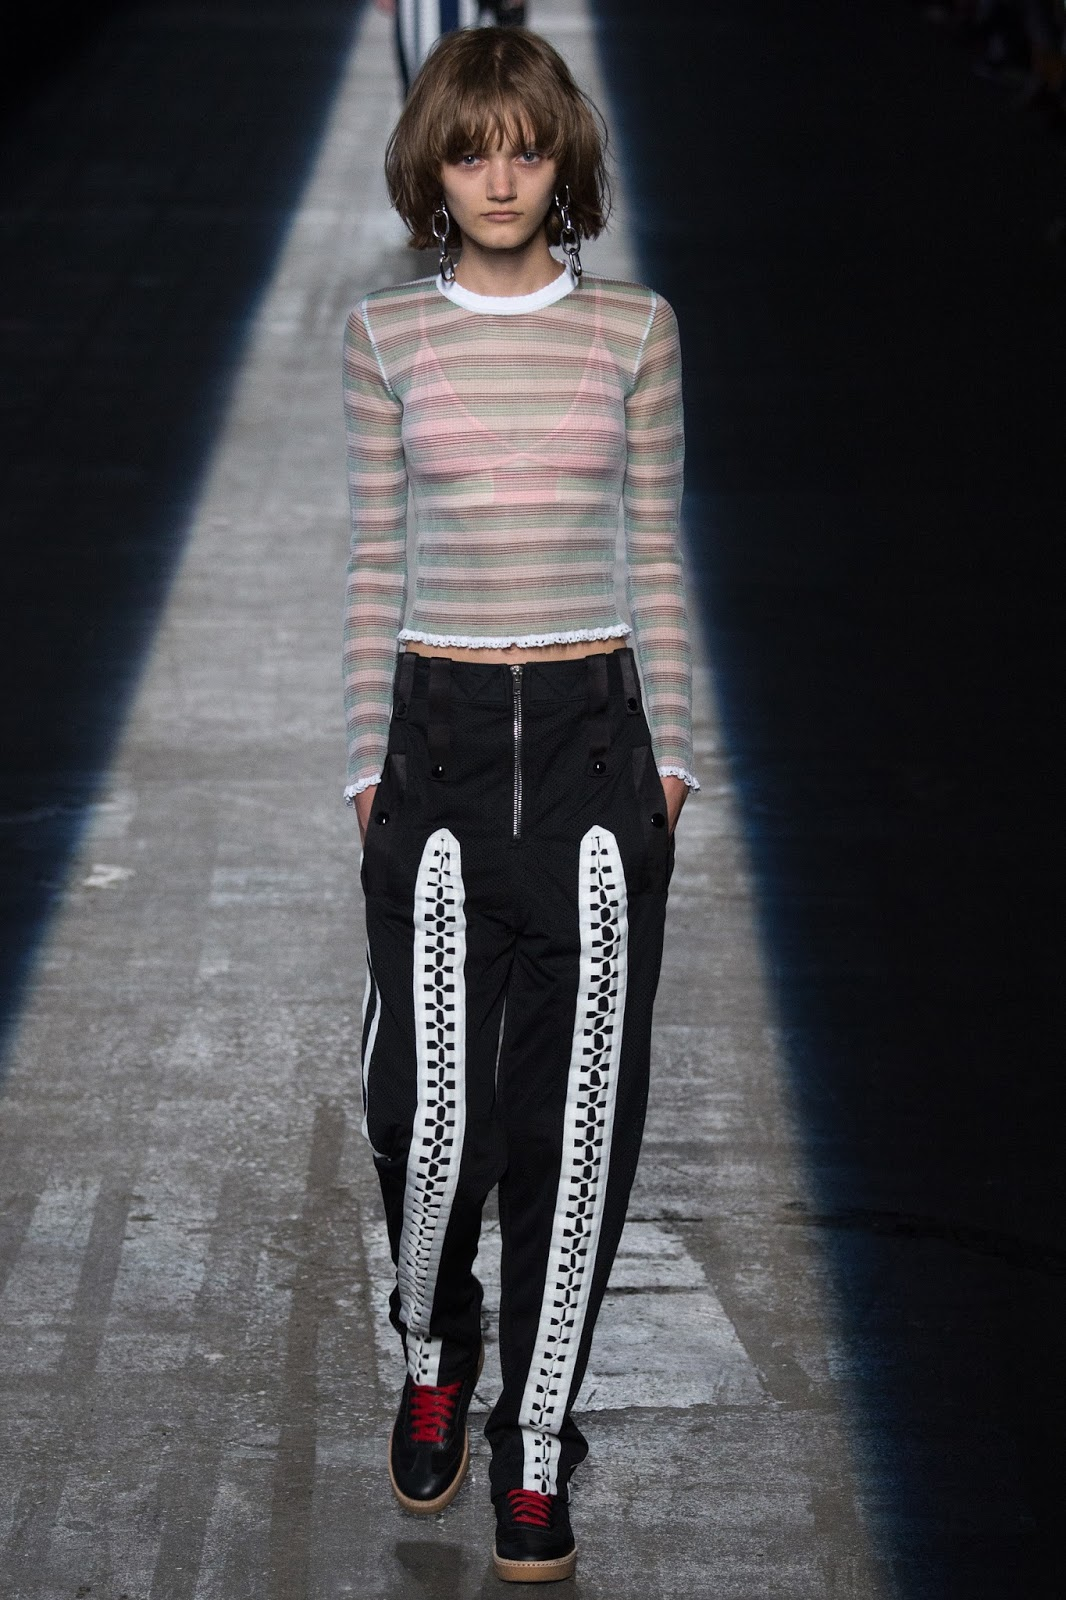 NYFW new york fashion week, soft bra, sheer